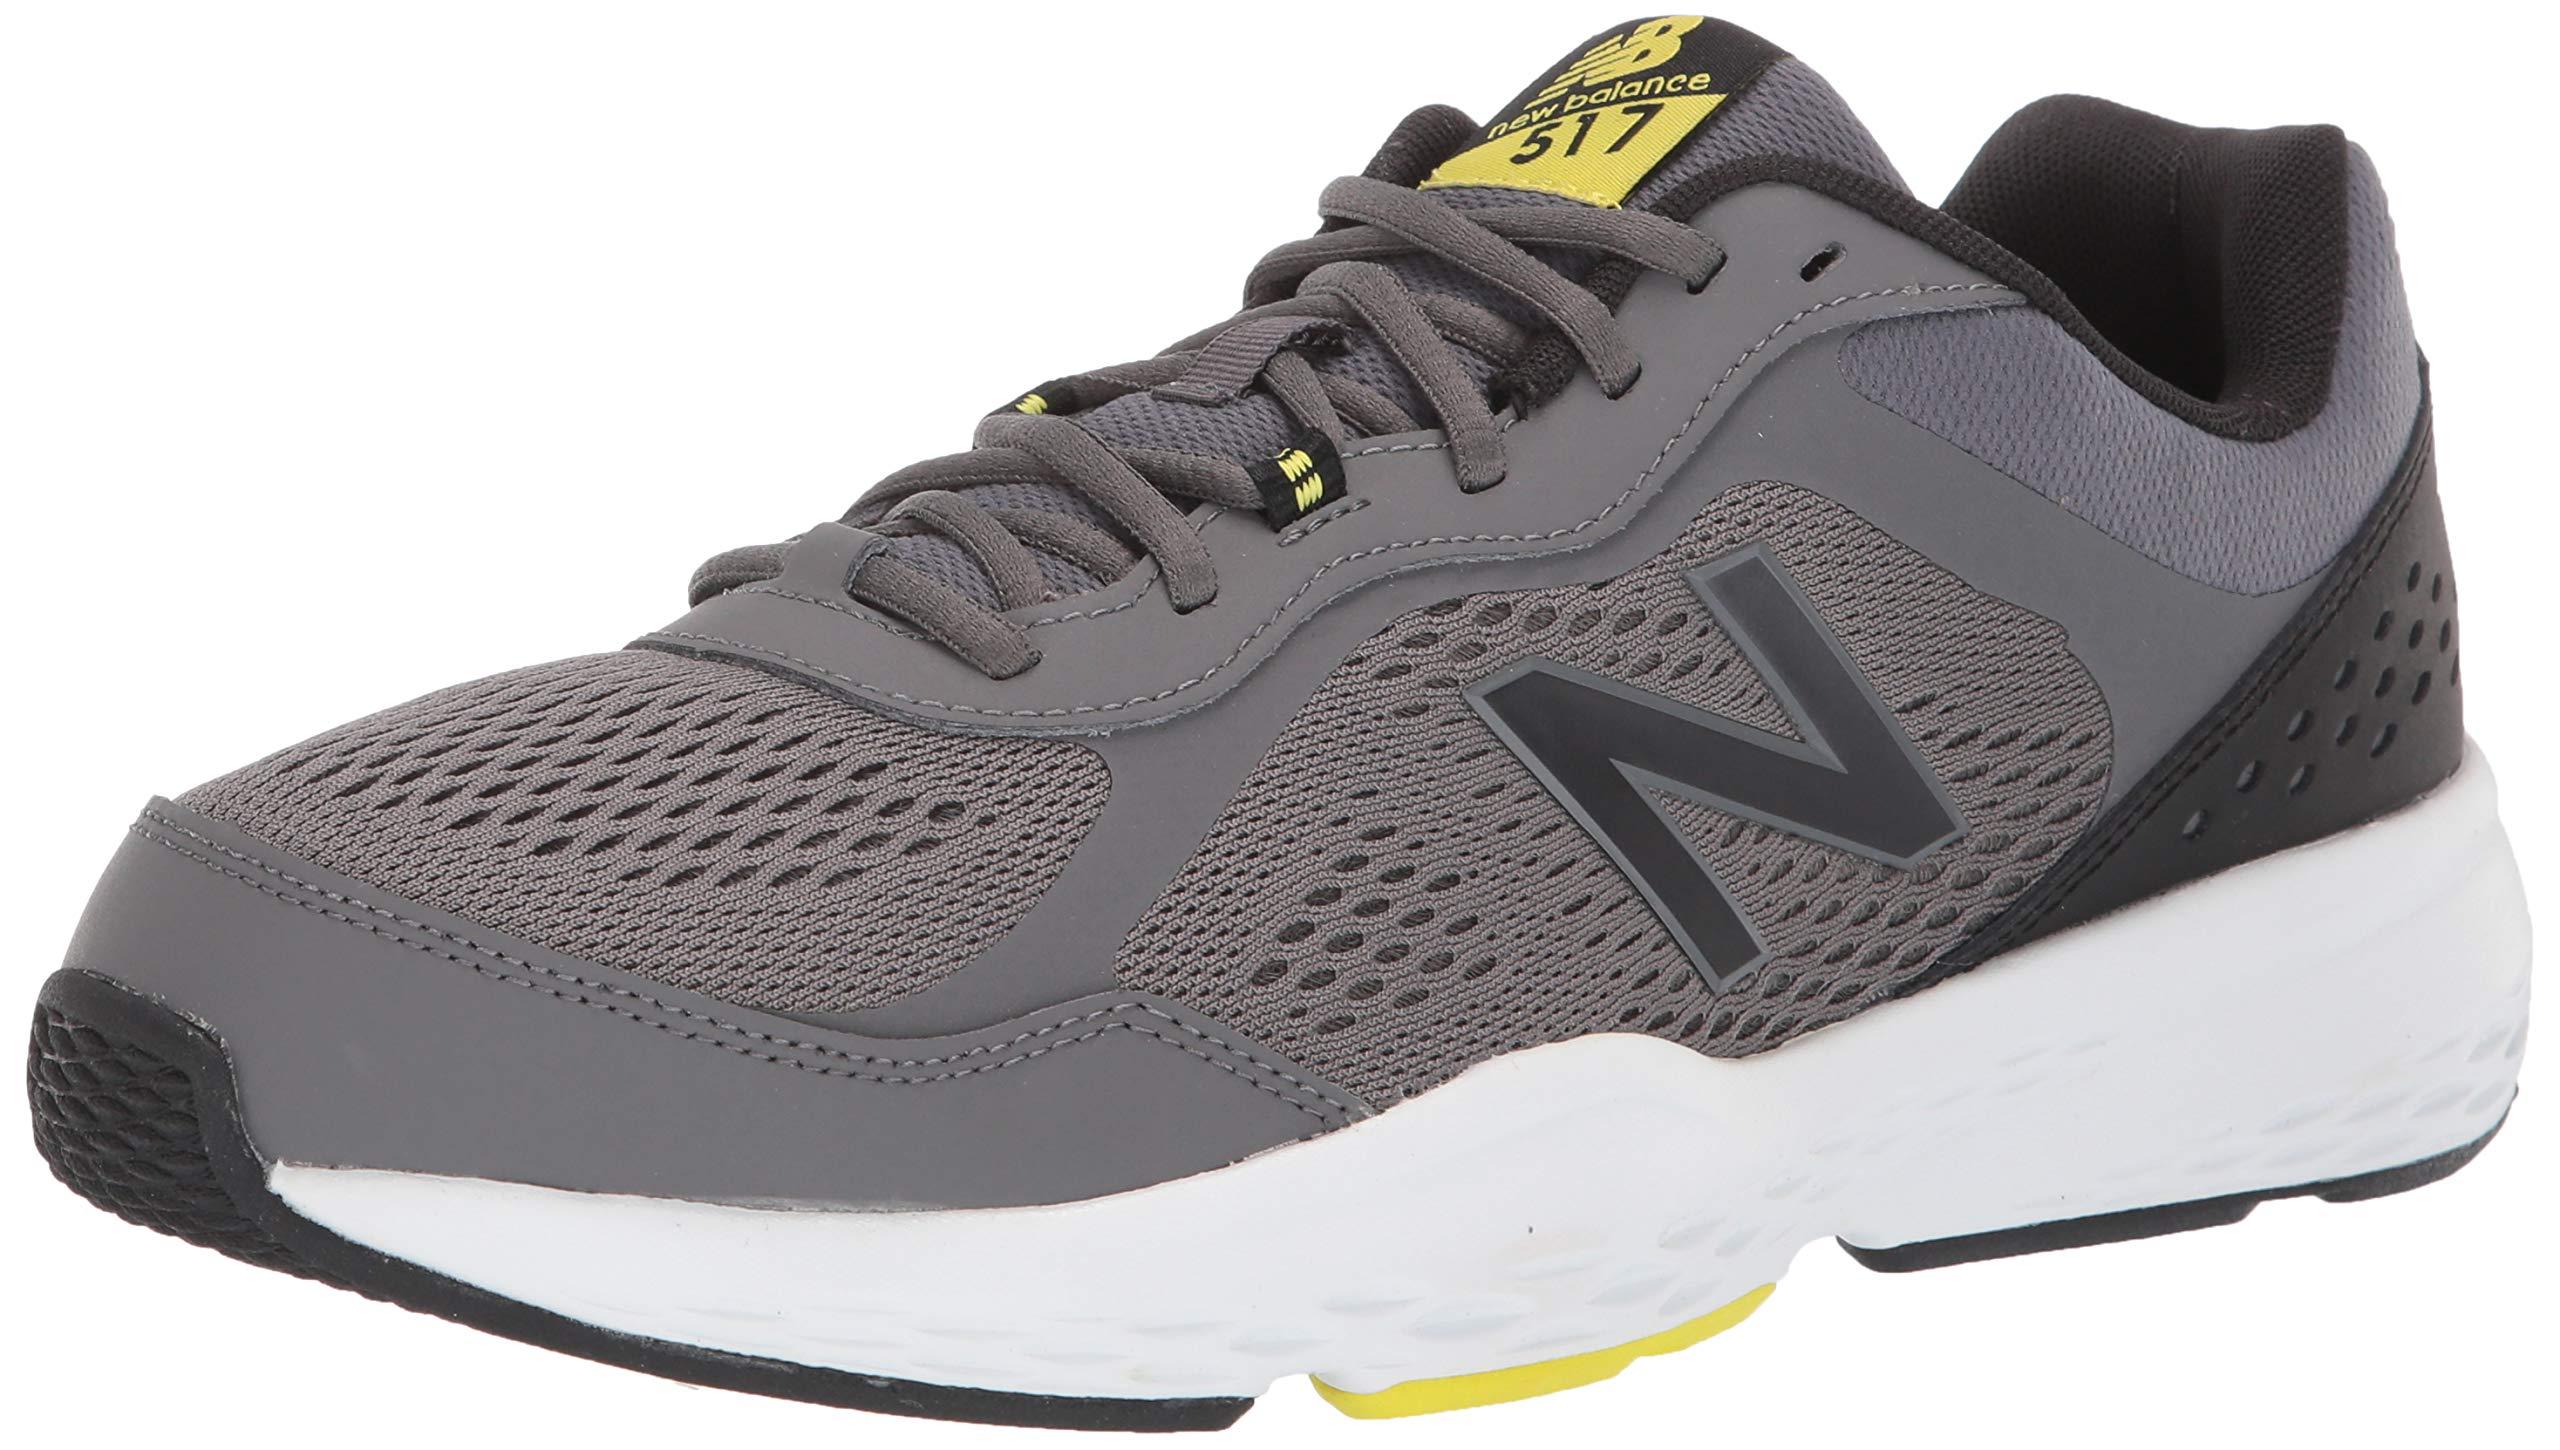 New Balance Men's 517v2 Cross Trainer, Castlerock/Sulphur Yellow, 10 W US by New Balance